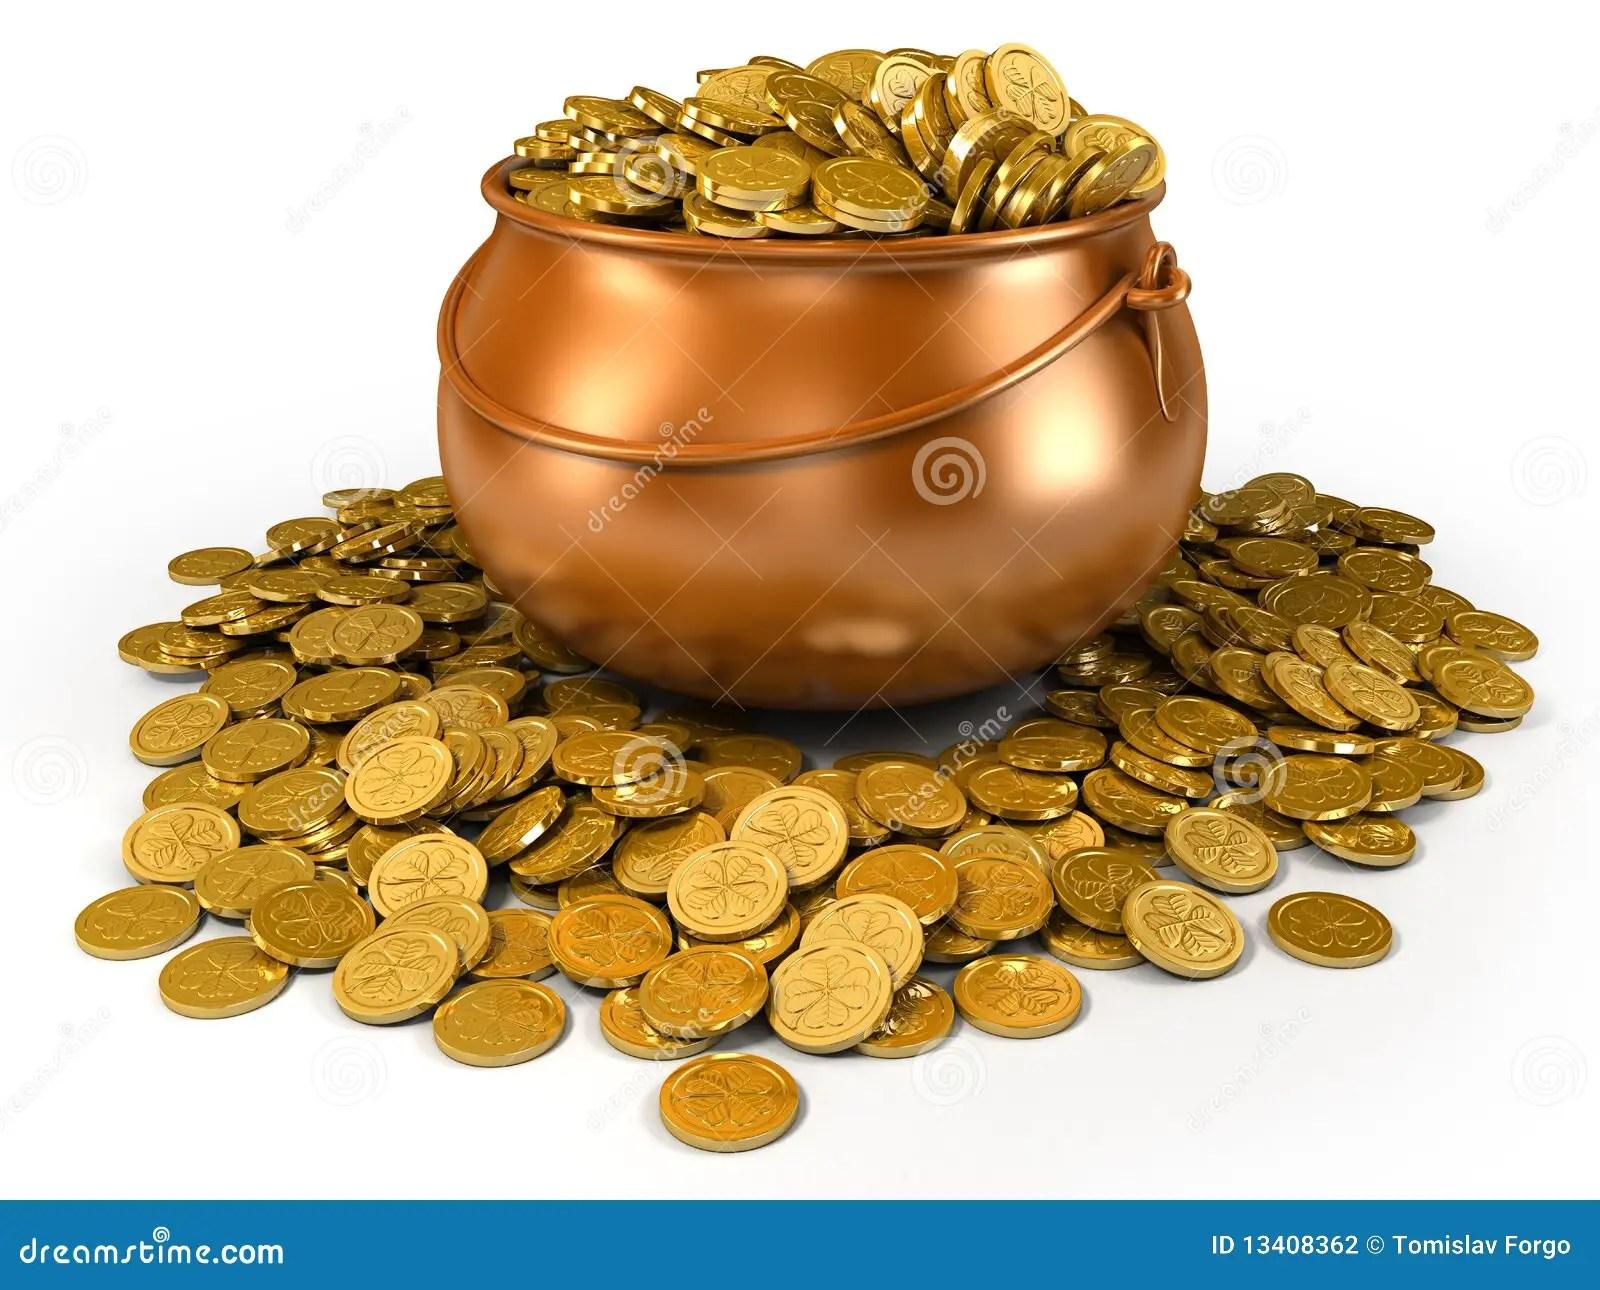 Crisol Por Completo De Monedas De Oro Stock de ilustracin